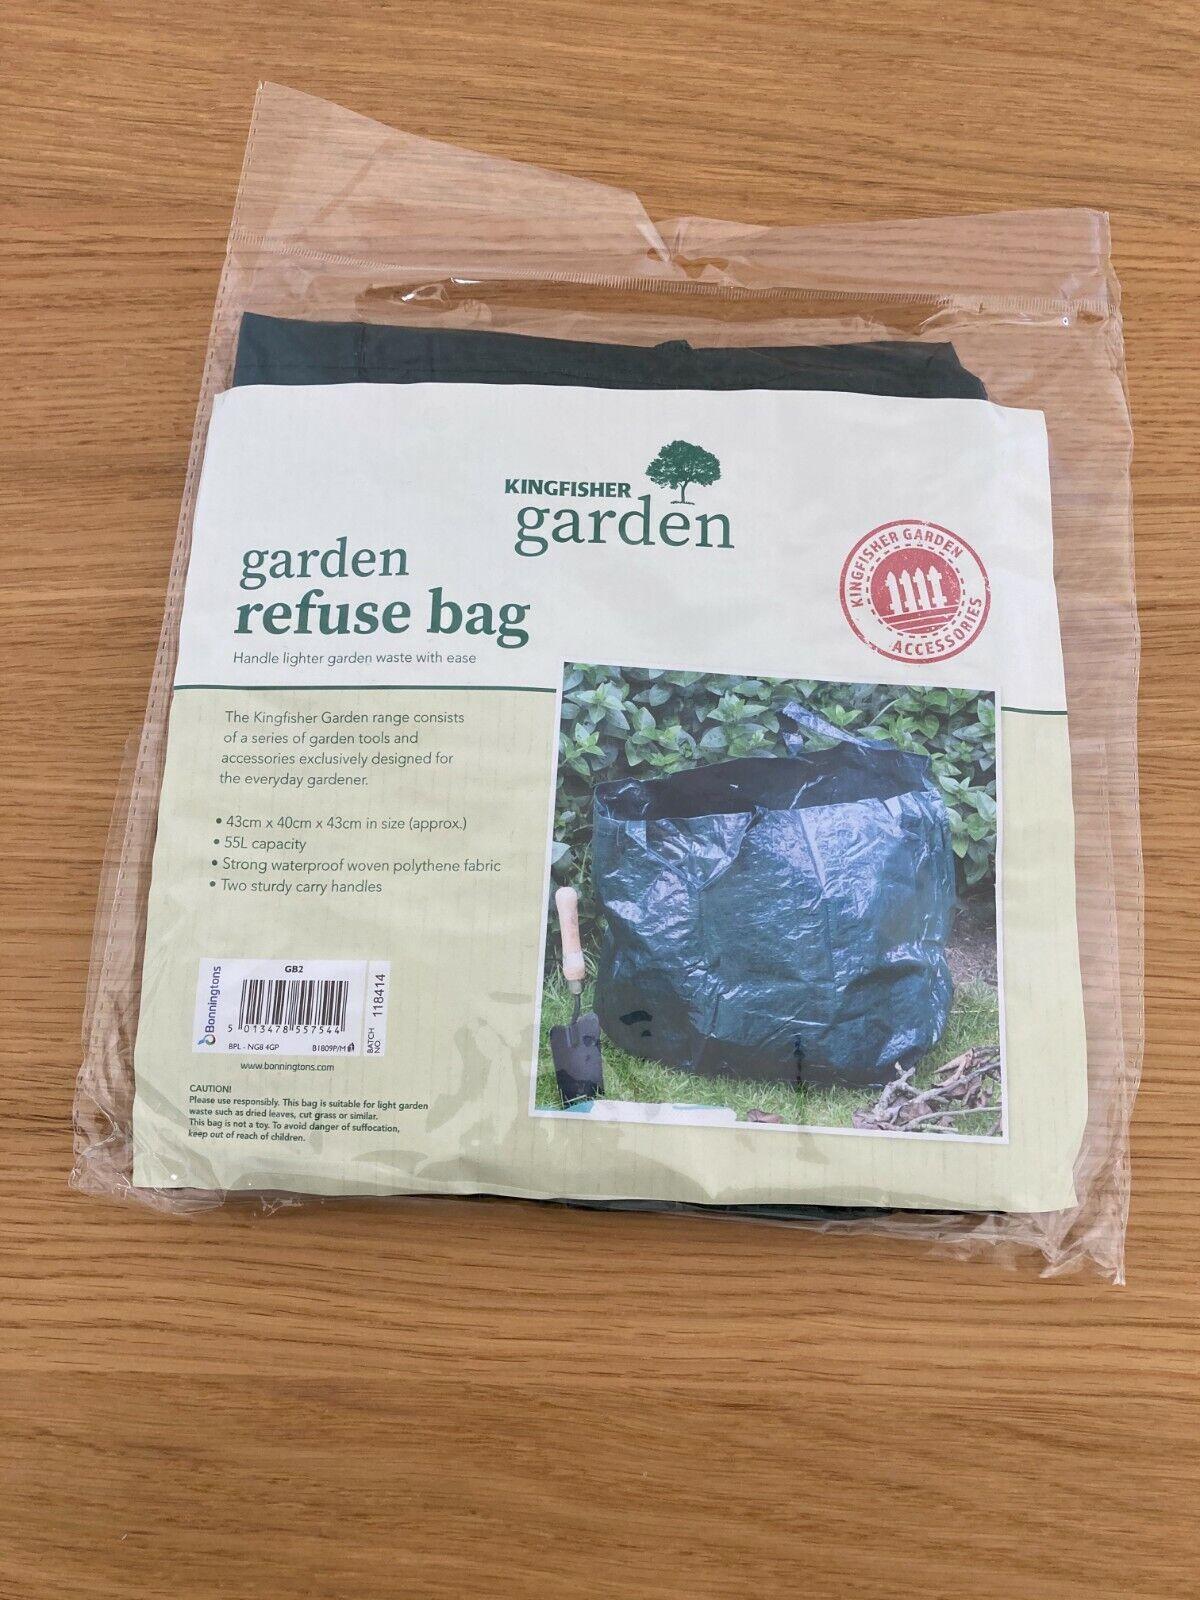 Garden Refuse Bag (strong, waterproof, 55L capacity, carry handles)